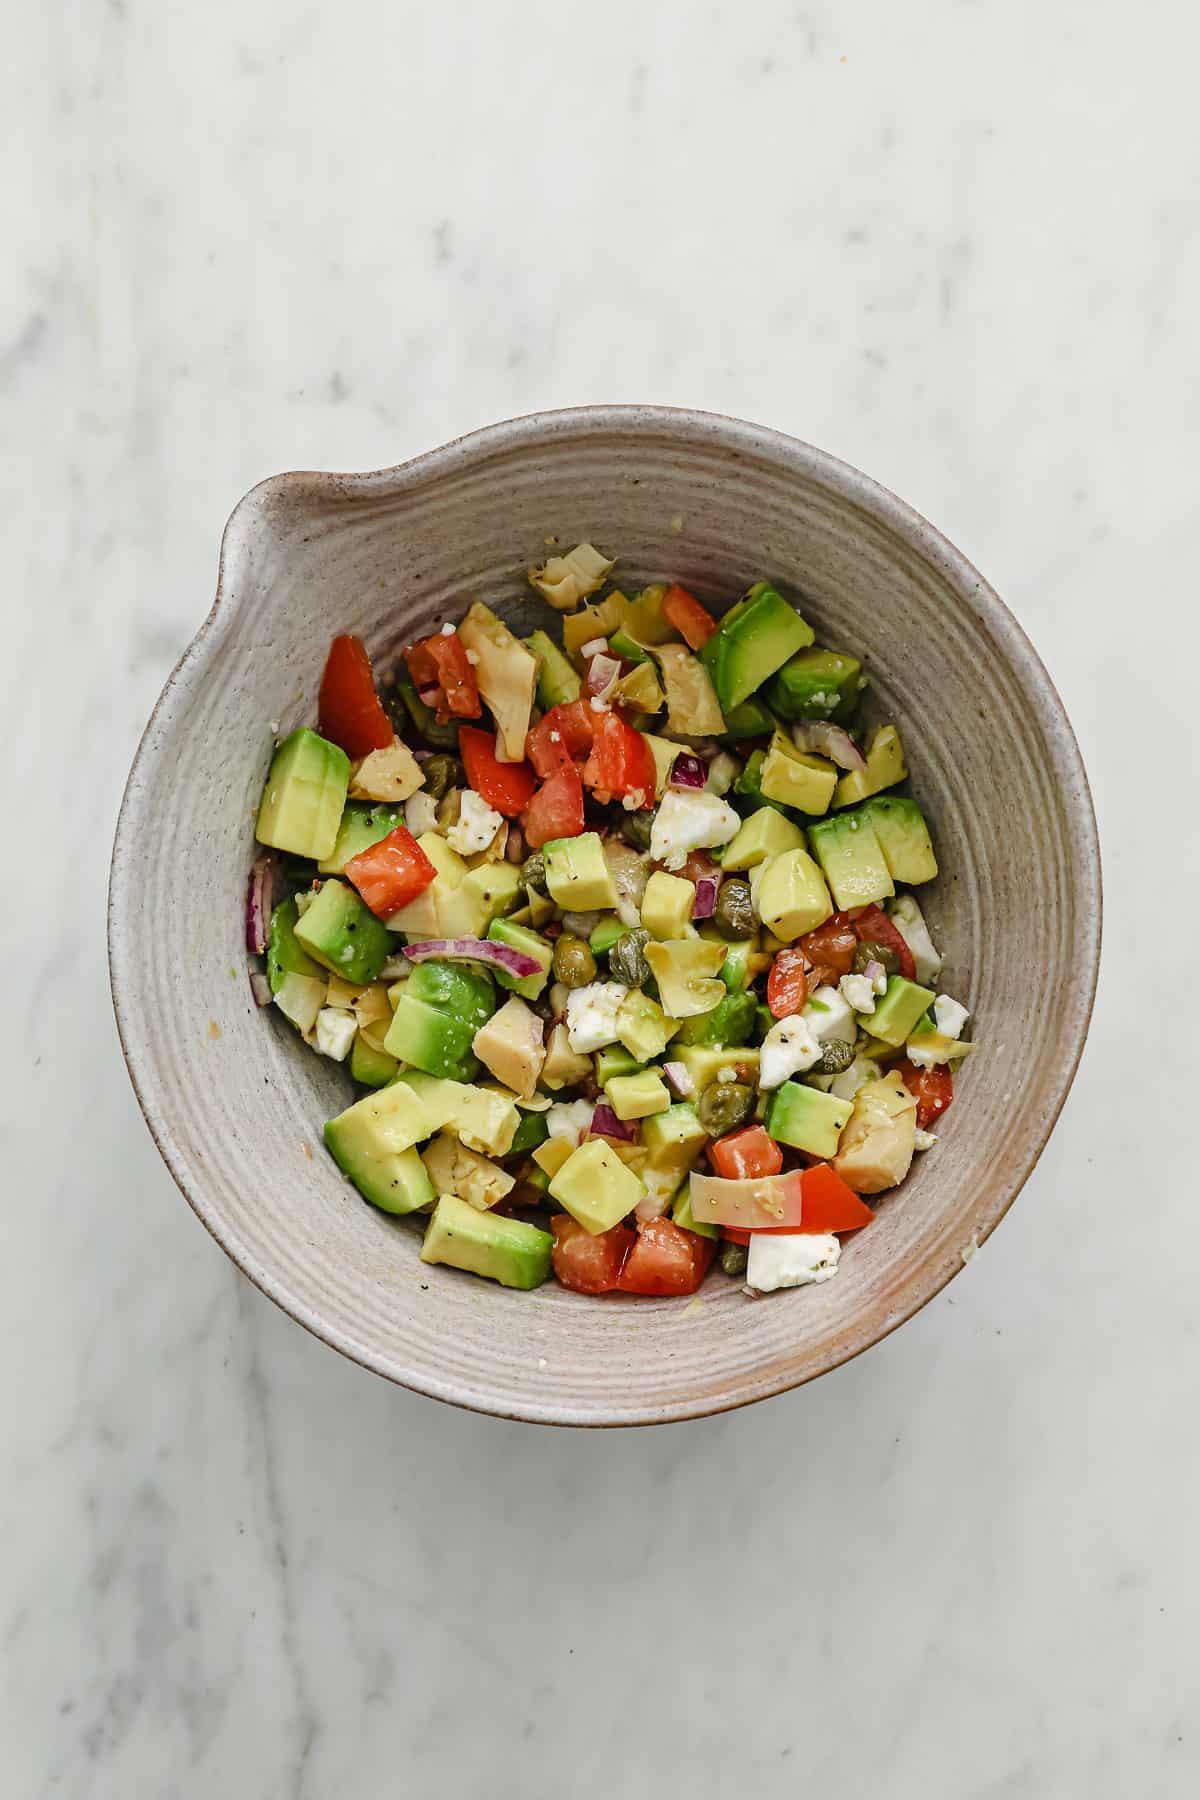 ceramic bowl with avocado salsa with tomatoes, garlic, onion, cilantro, lime juice